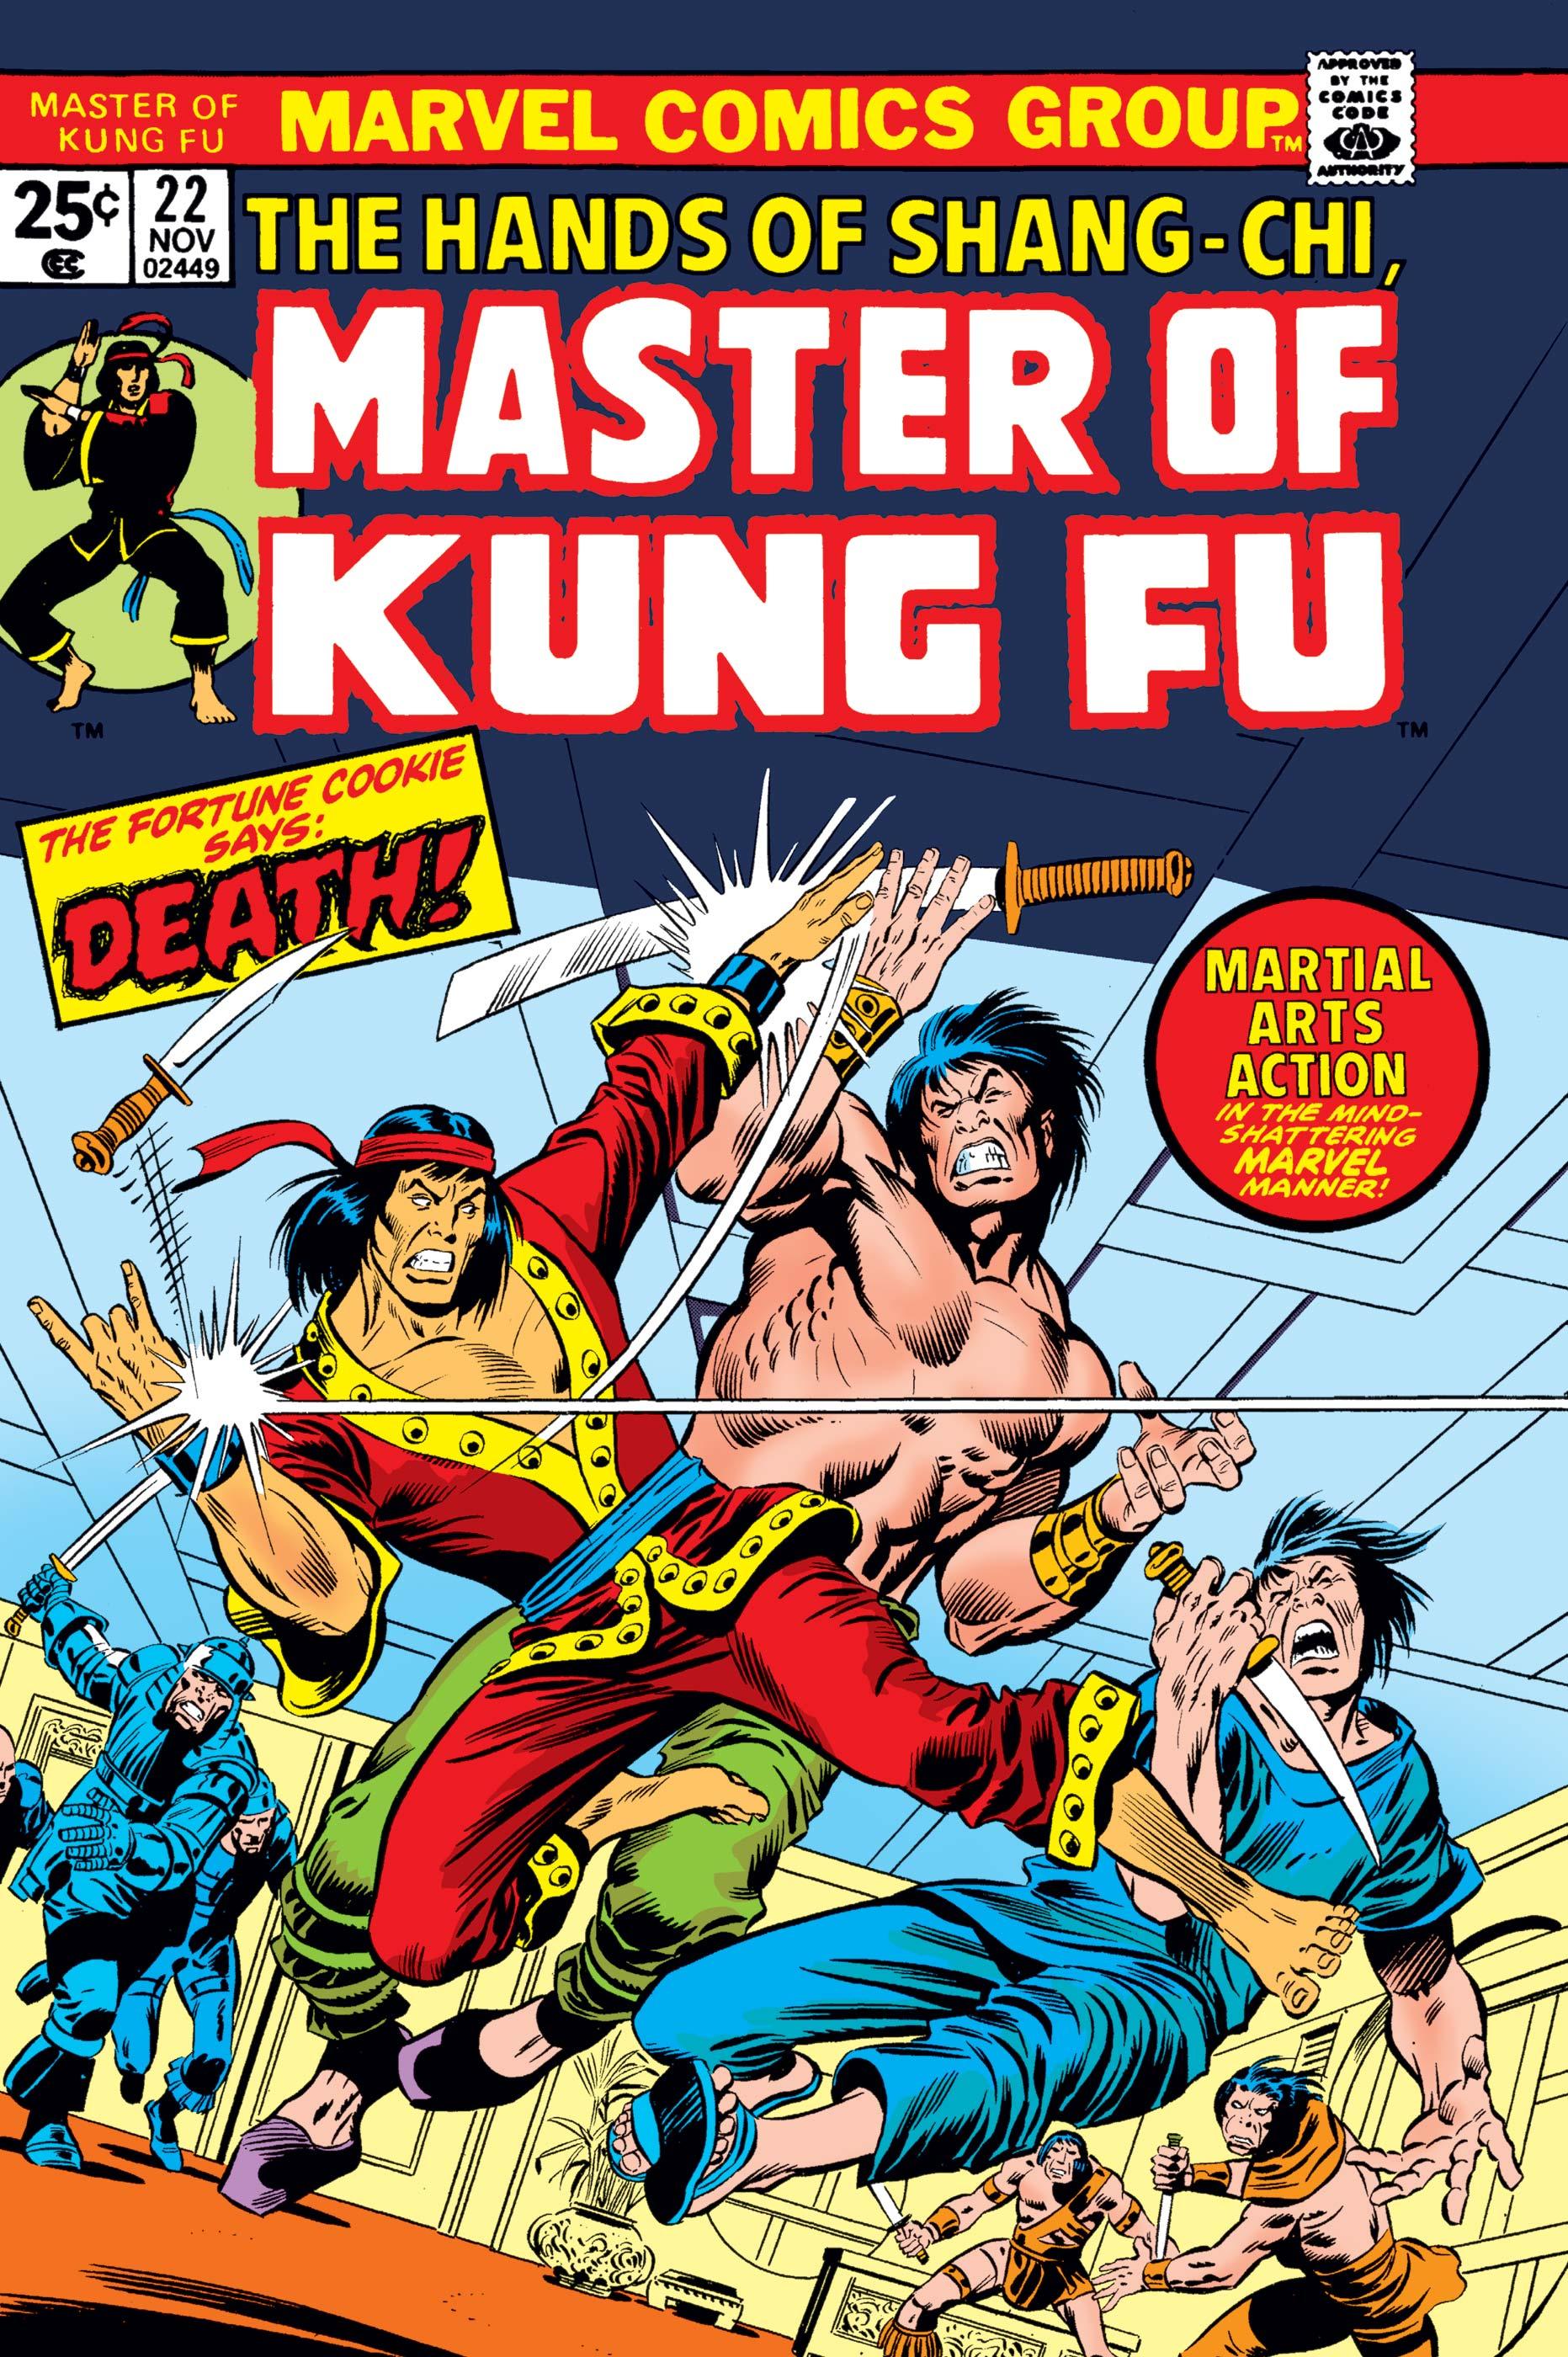 Master of Kung Fu (1974) #22